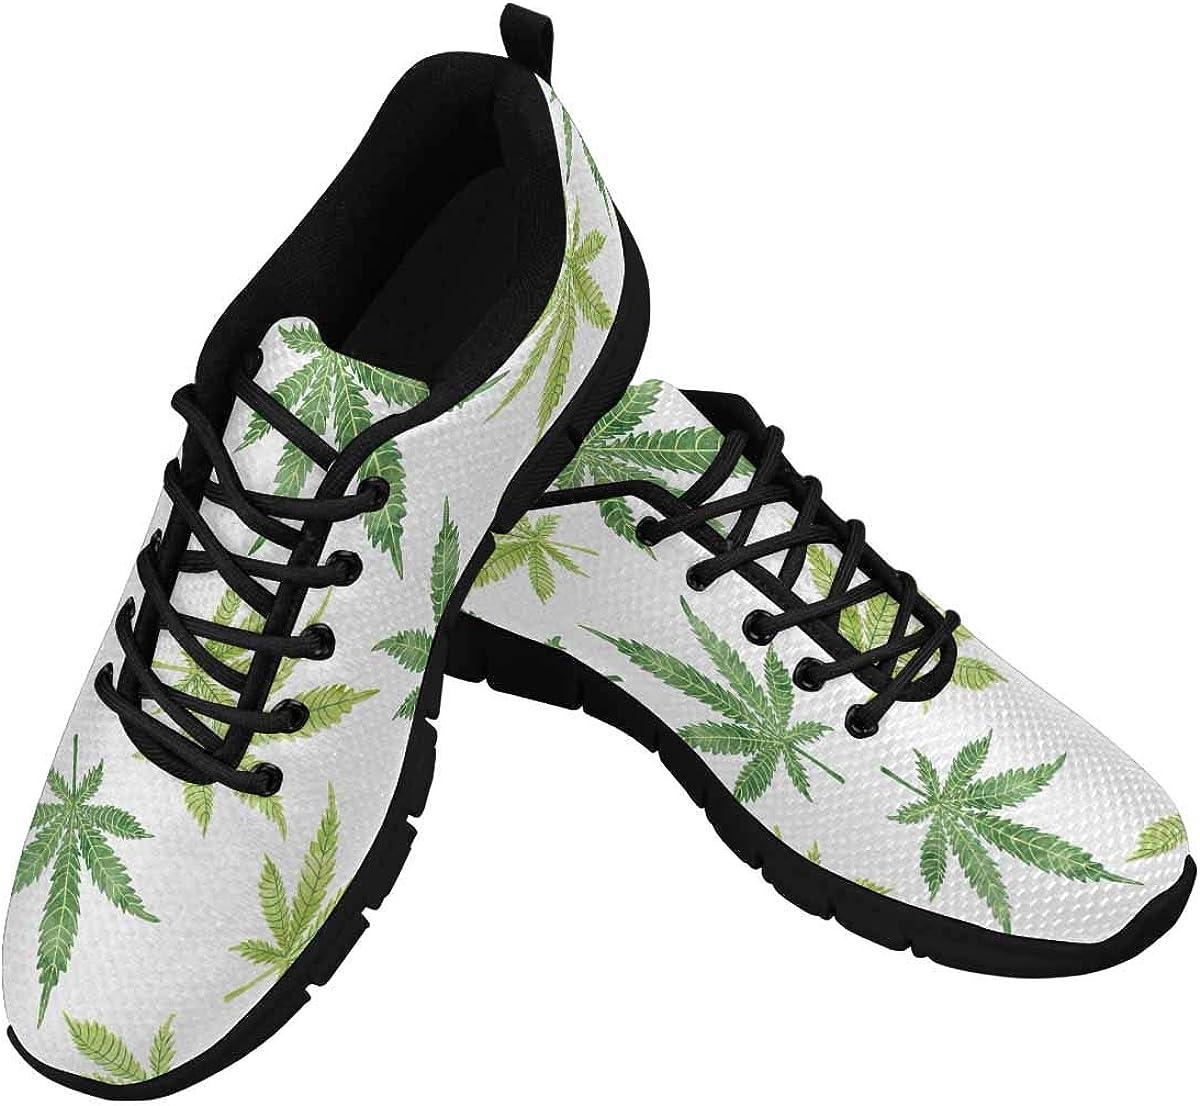 INTERESTPRINT Watercolor Cannabis Marijuana Leaves Women's Lightweight Athletic Casual Gym Sneakers